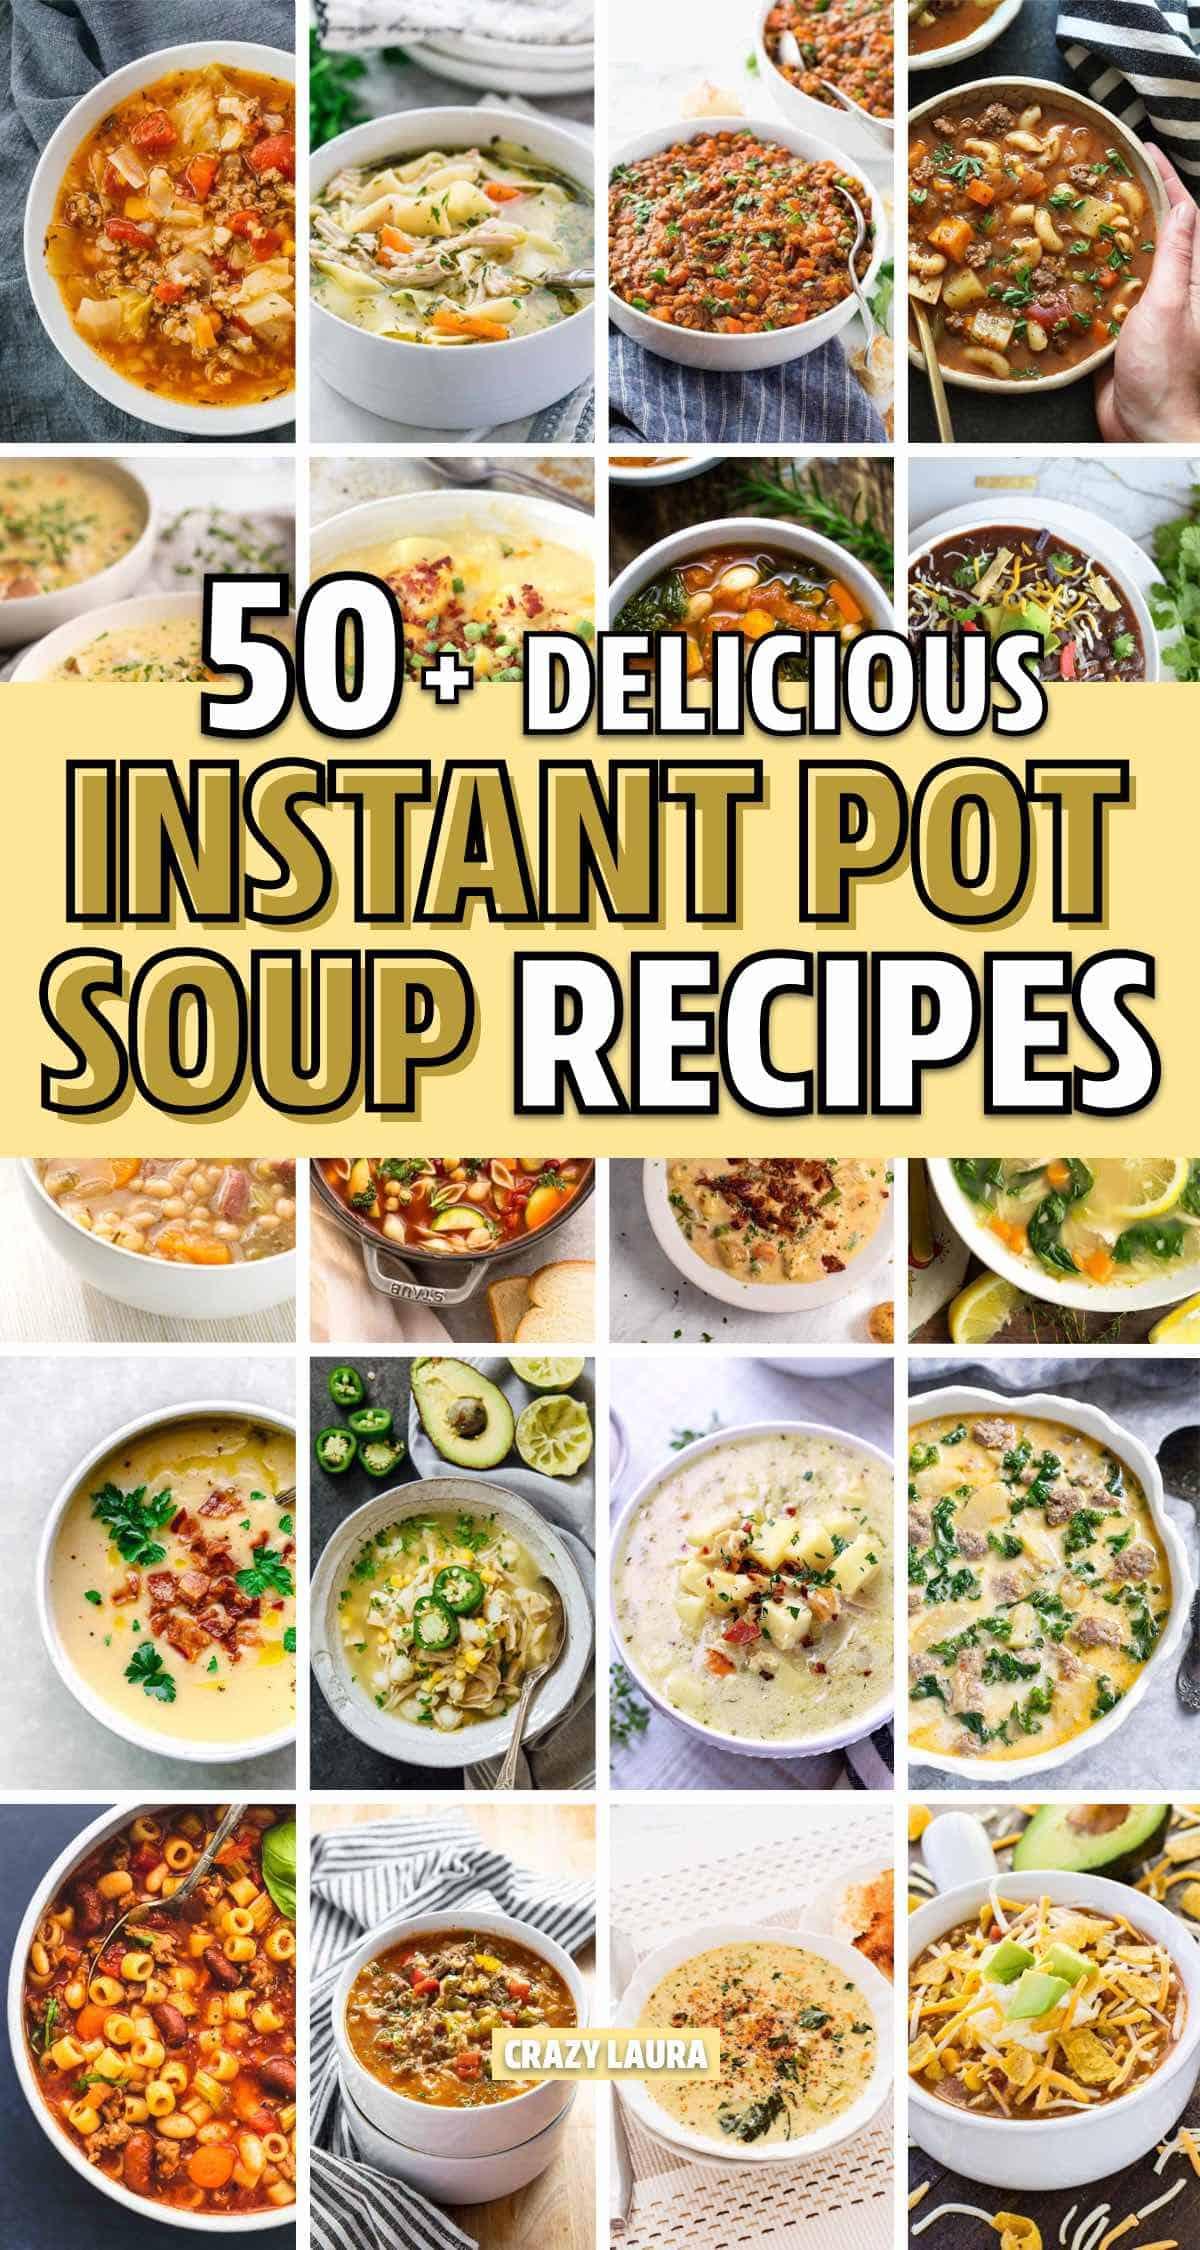 new insta pot recipe ideas